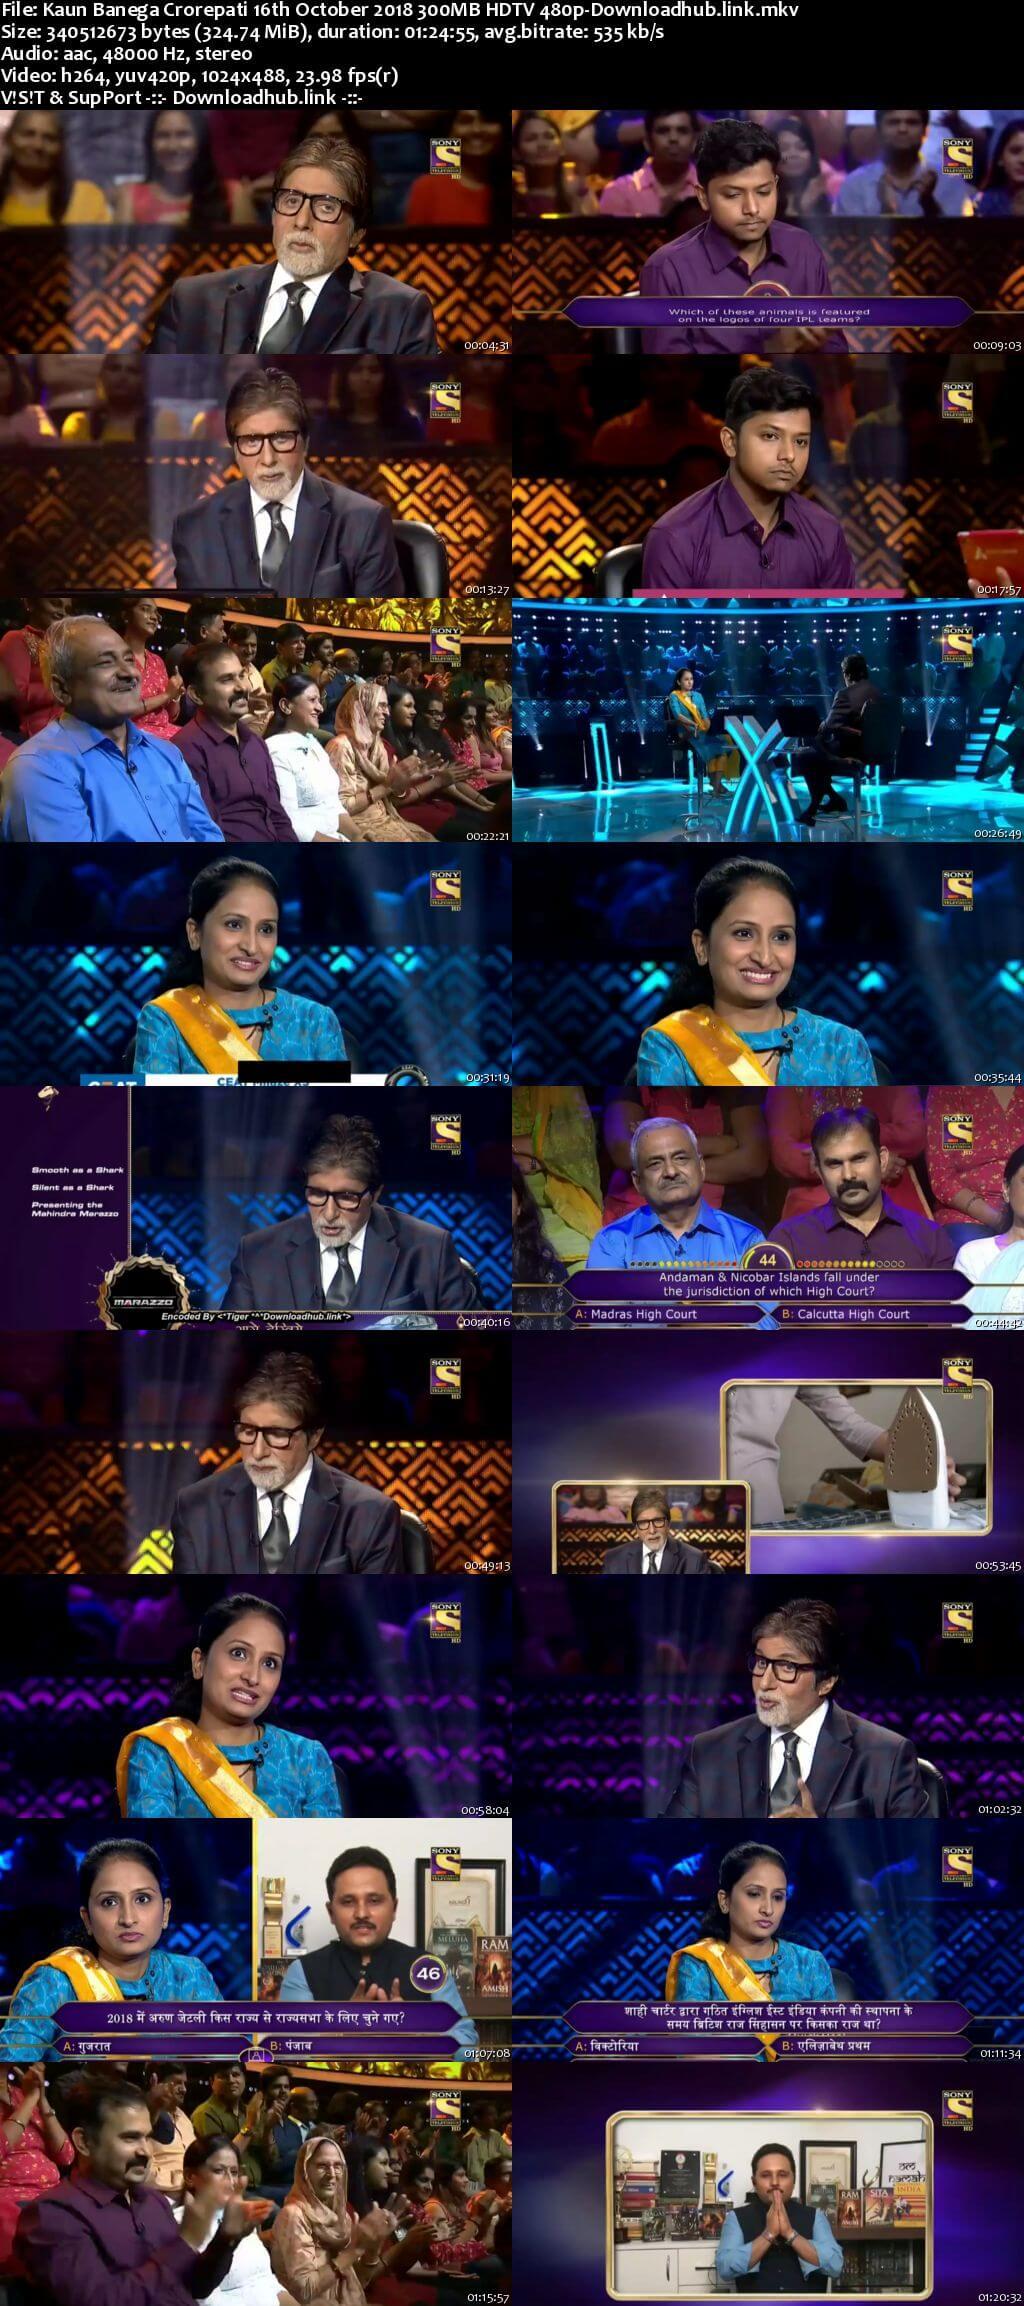 Kaun Banega Crorepati 16th October 2018 300MB HDTV 480p